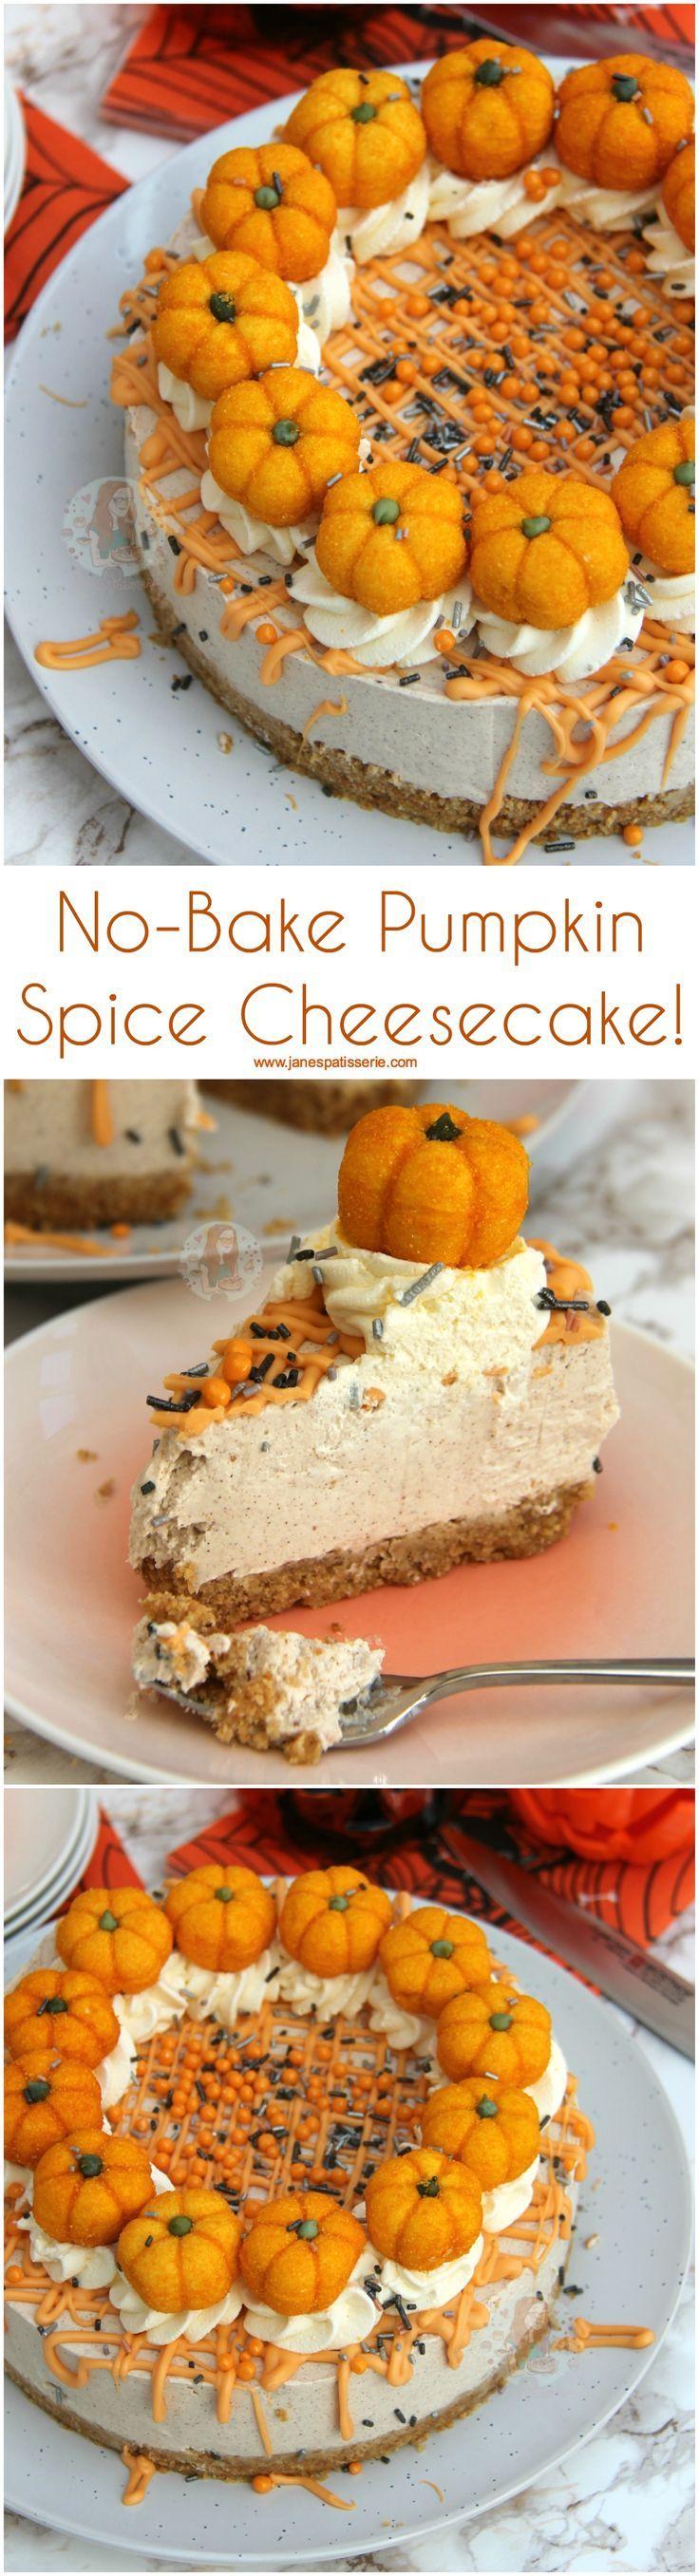 Best 20 Easy No Bake Cheesecake Ideas On Pinterest No Bake Cheesecake Easy Cream Cheese Desserts And Bake Cheesecake Recipe